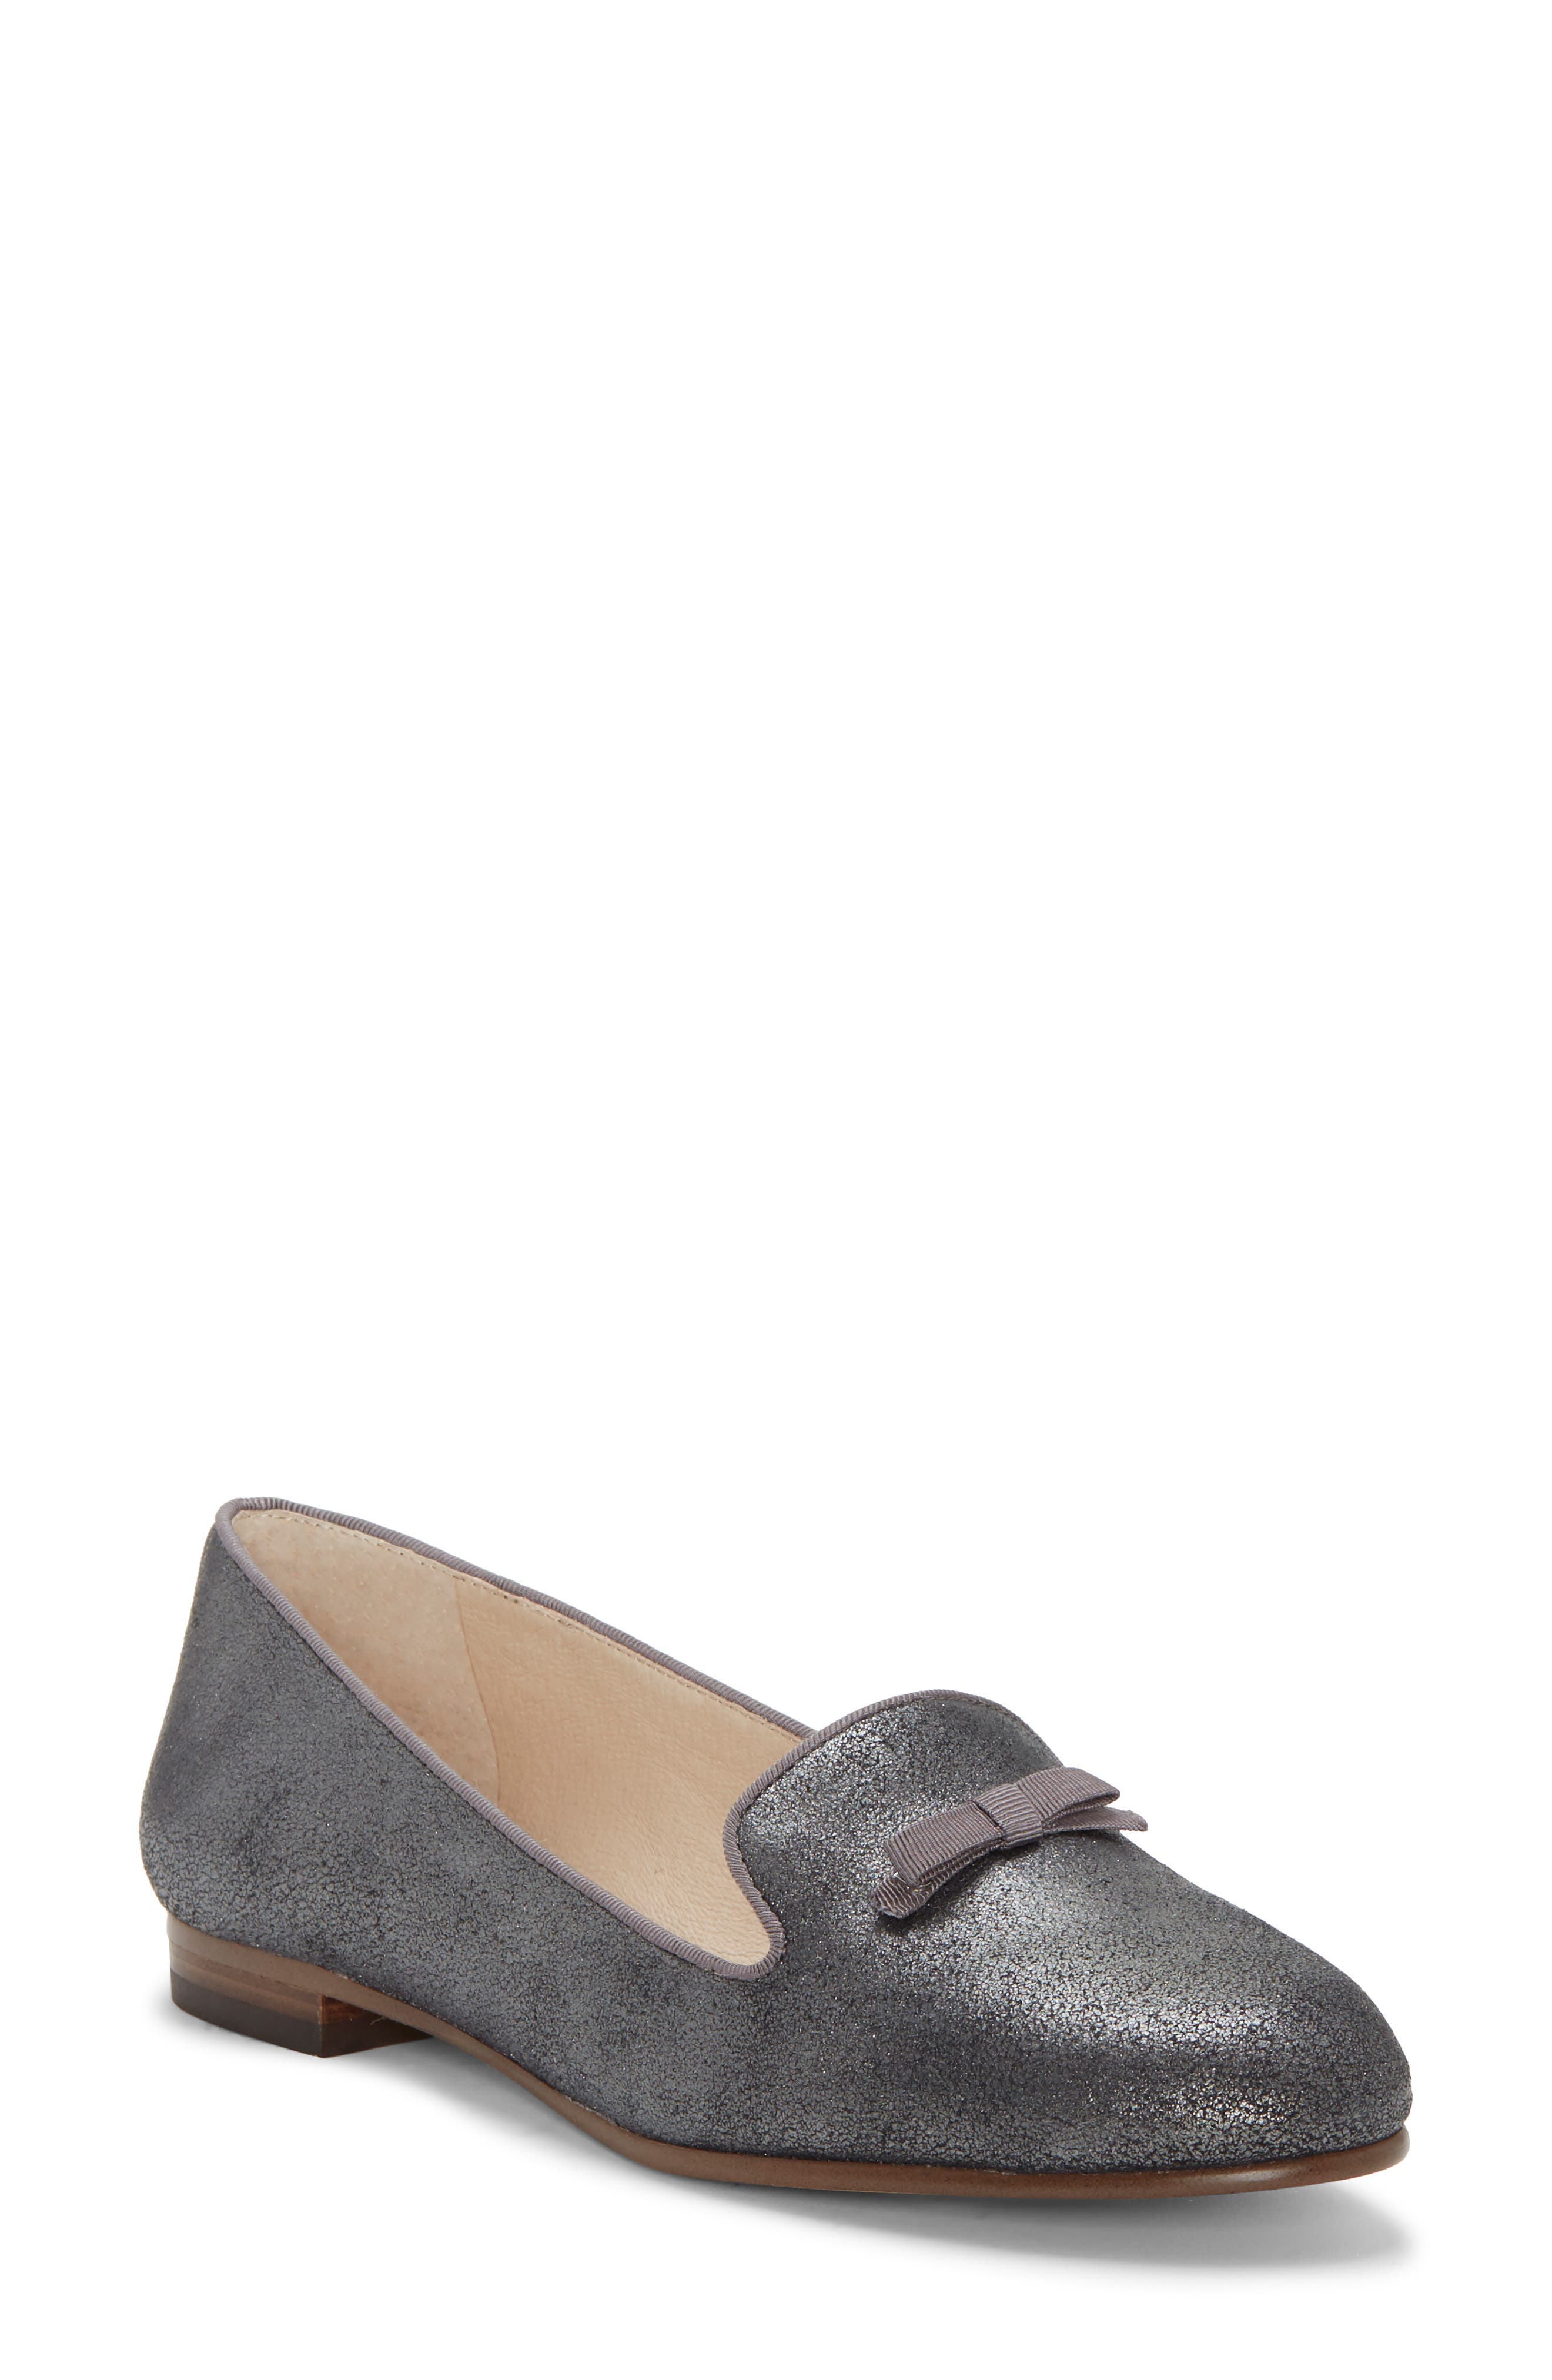 Louise Et Cie Anniston Flat- Grey